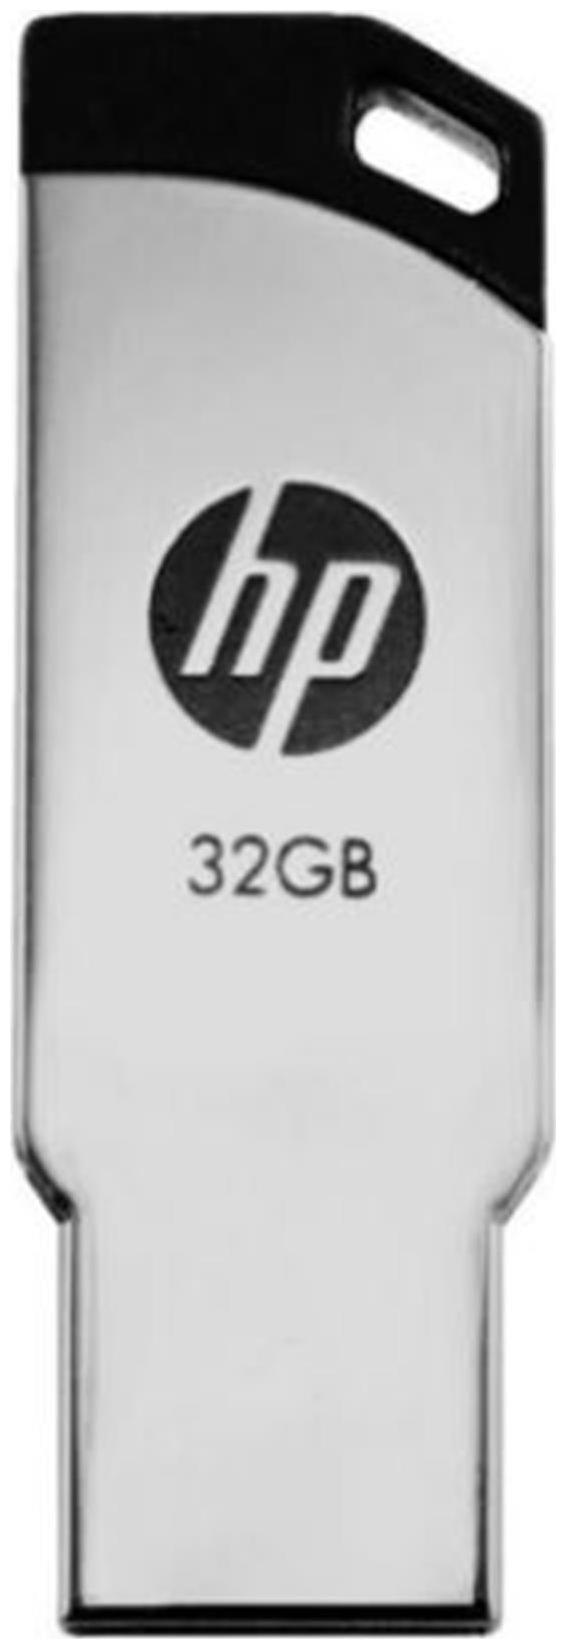 https://assetscdn1.paytm.com/images/catalog/product/S/ST/STOHP-V236W-USBKRIS586894ADBF628/1562680146888_0.JPG